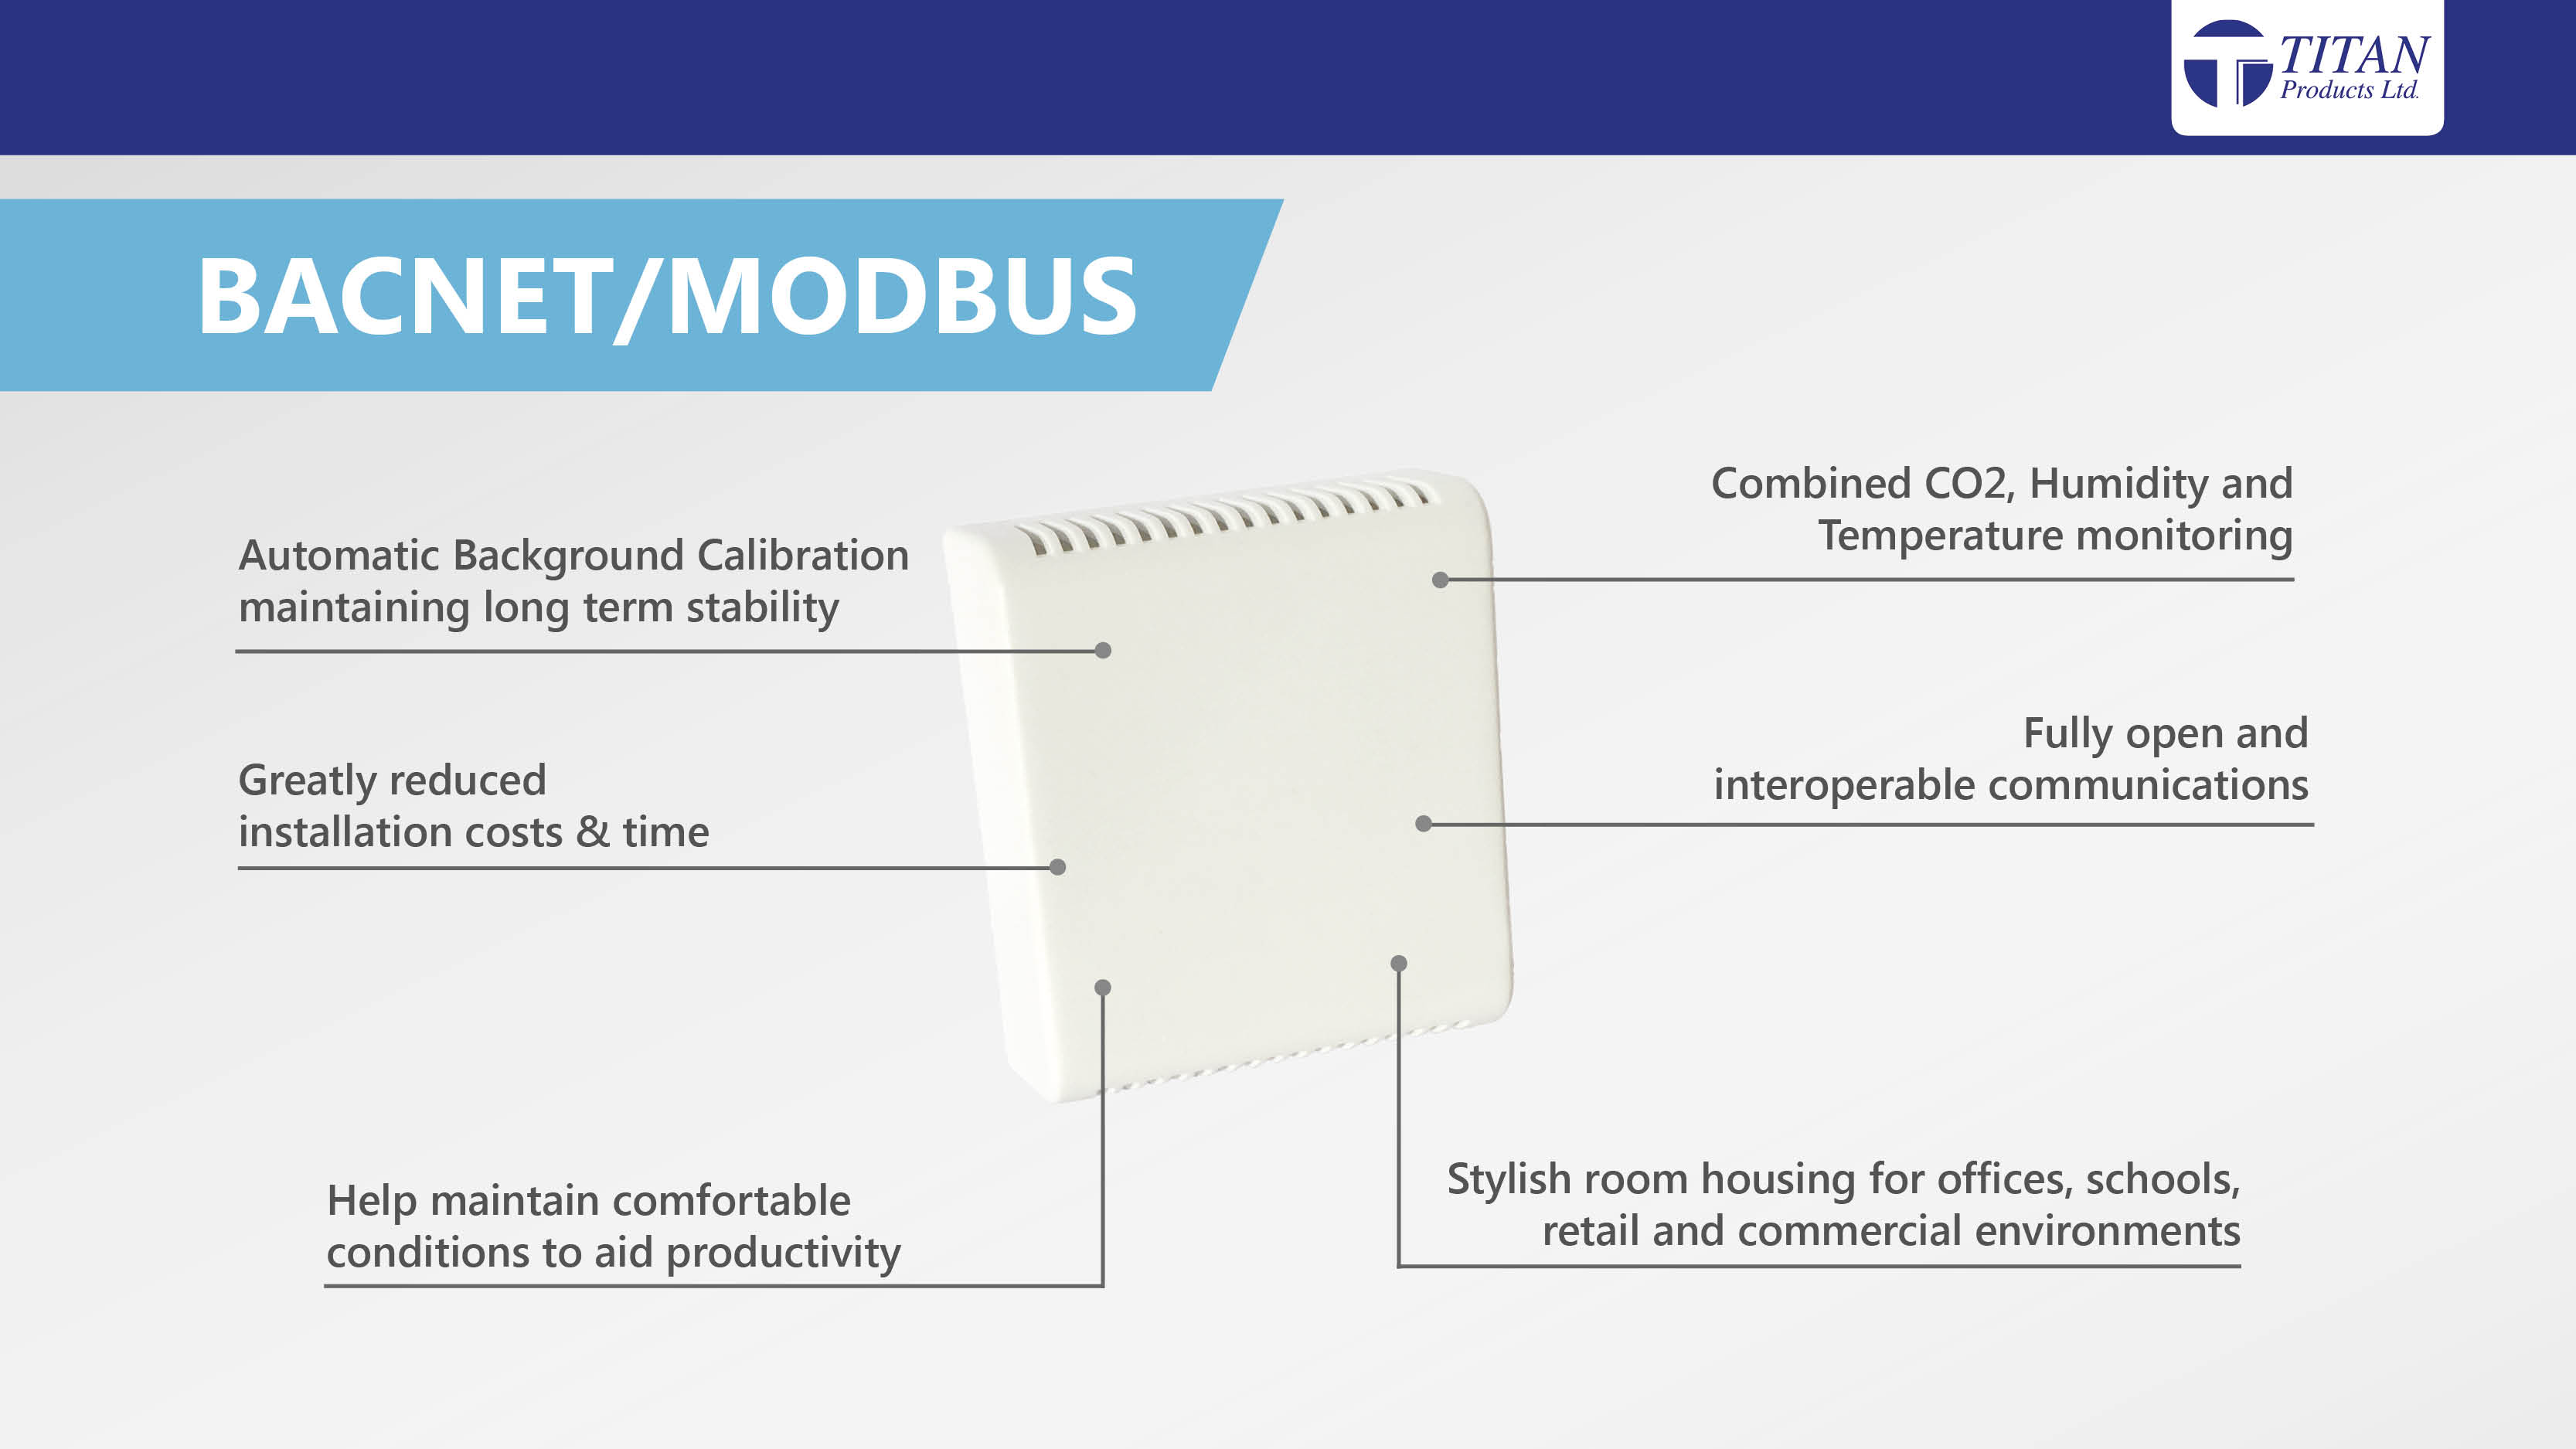 bacnet mstp wiring guidelines basic wiring diagram u2022 rh rnetcomputer co BACnet MS TP Addressing MS TP BACnet Sniffer